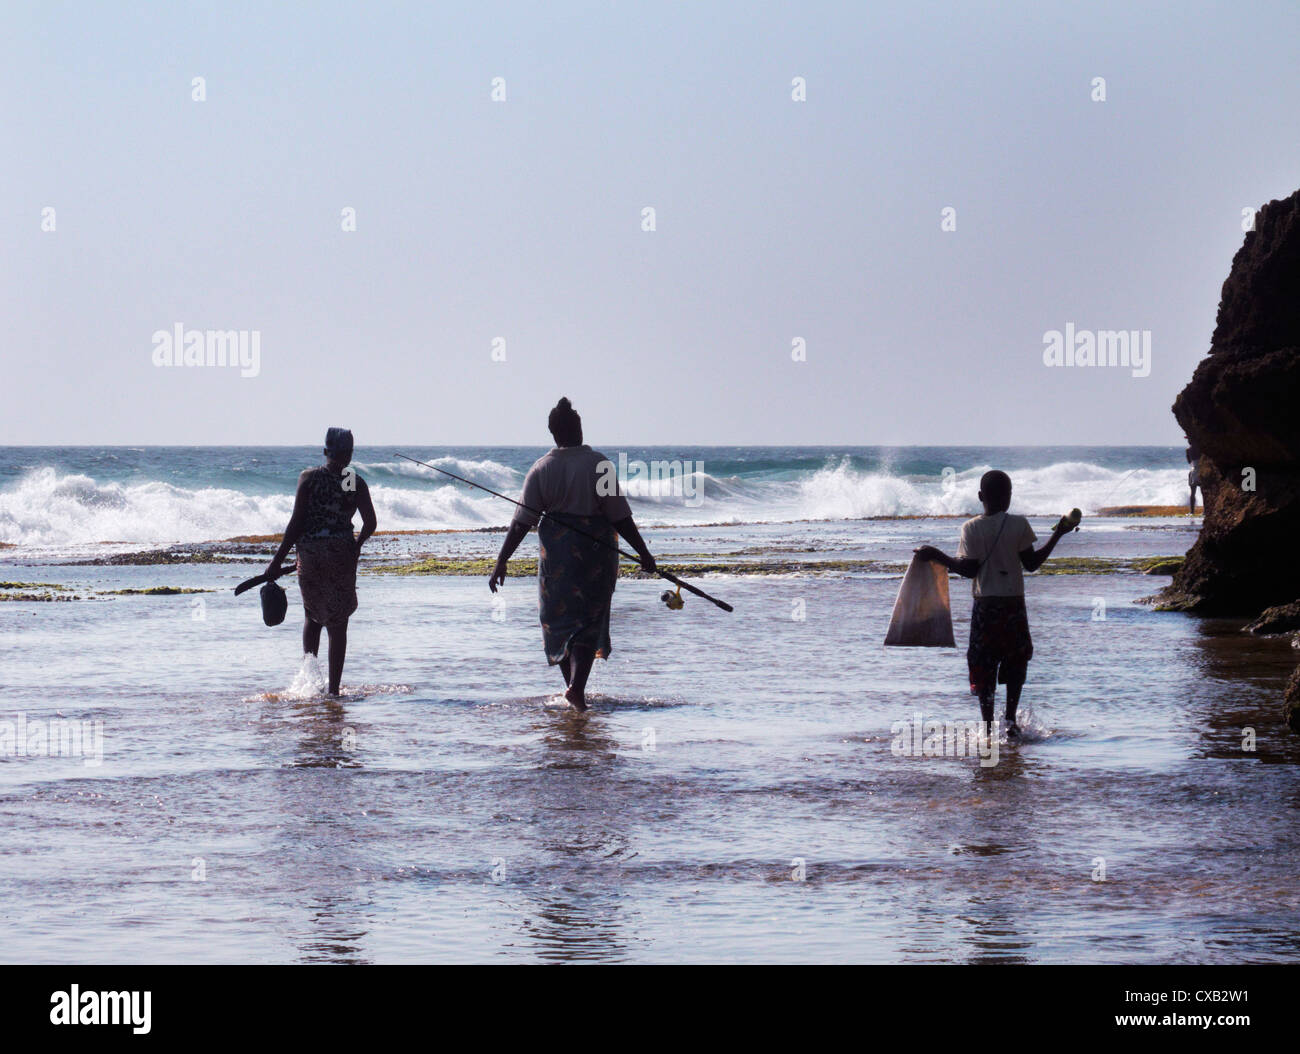 Familia ir a pescar. Ponta do Ouro, en el sur de Mozambique. Imagen De Stock